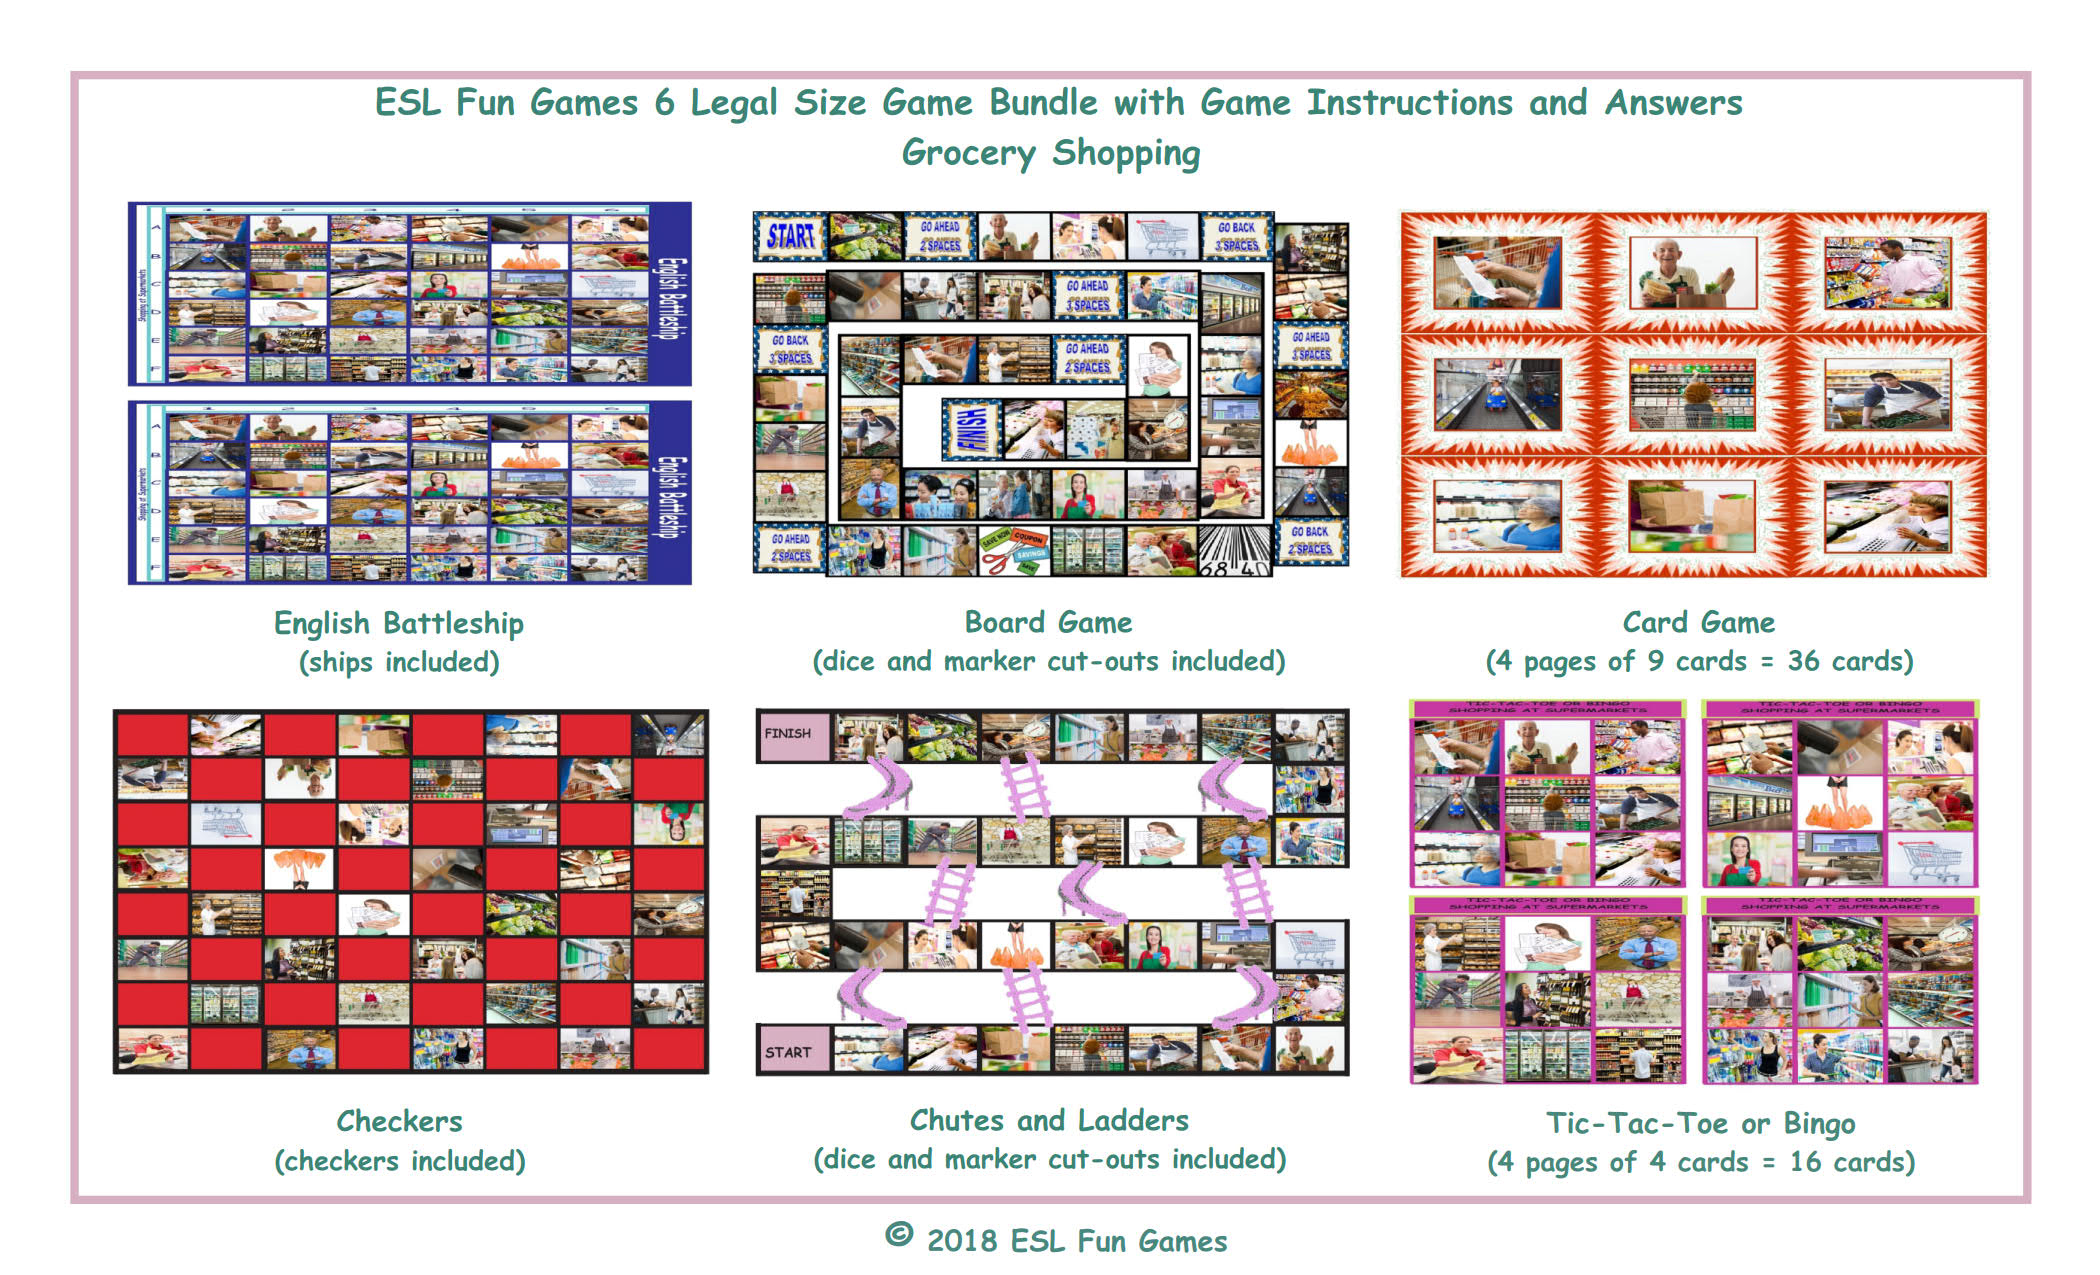 Grocery Shopping 6 English Legal Photo Game Bundle